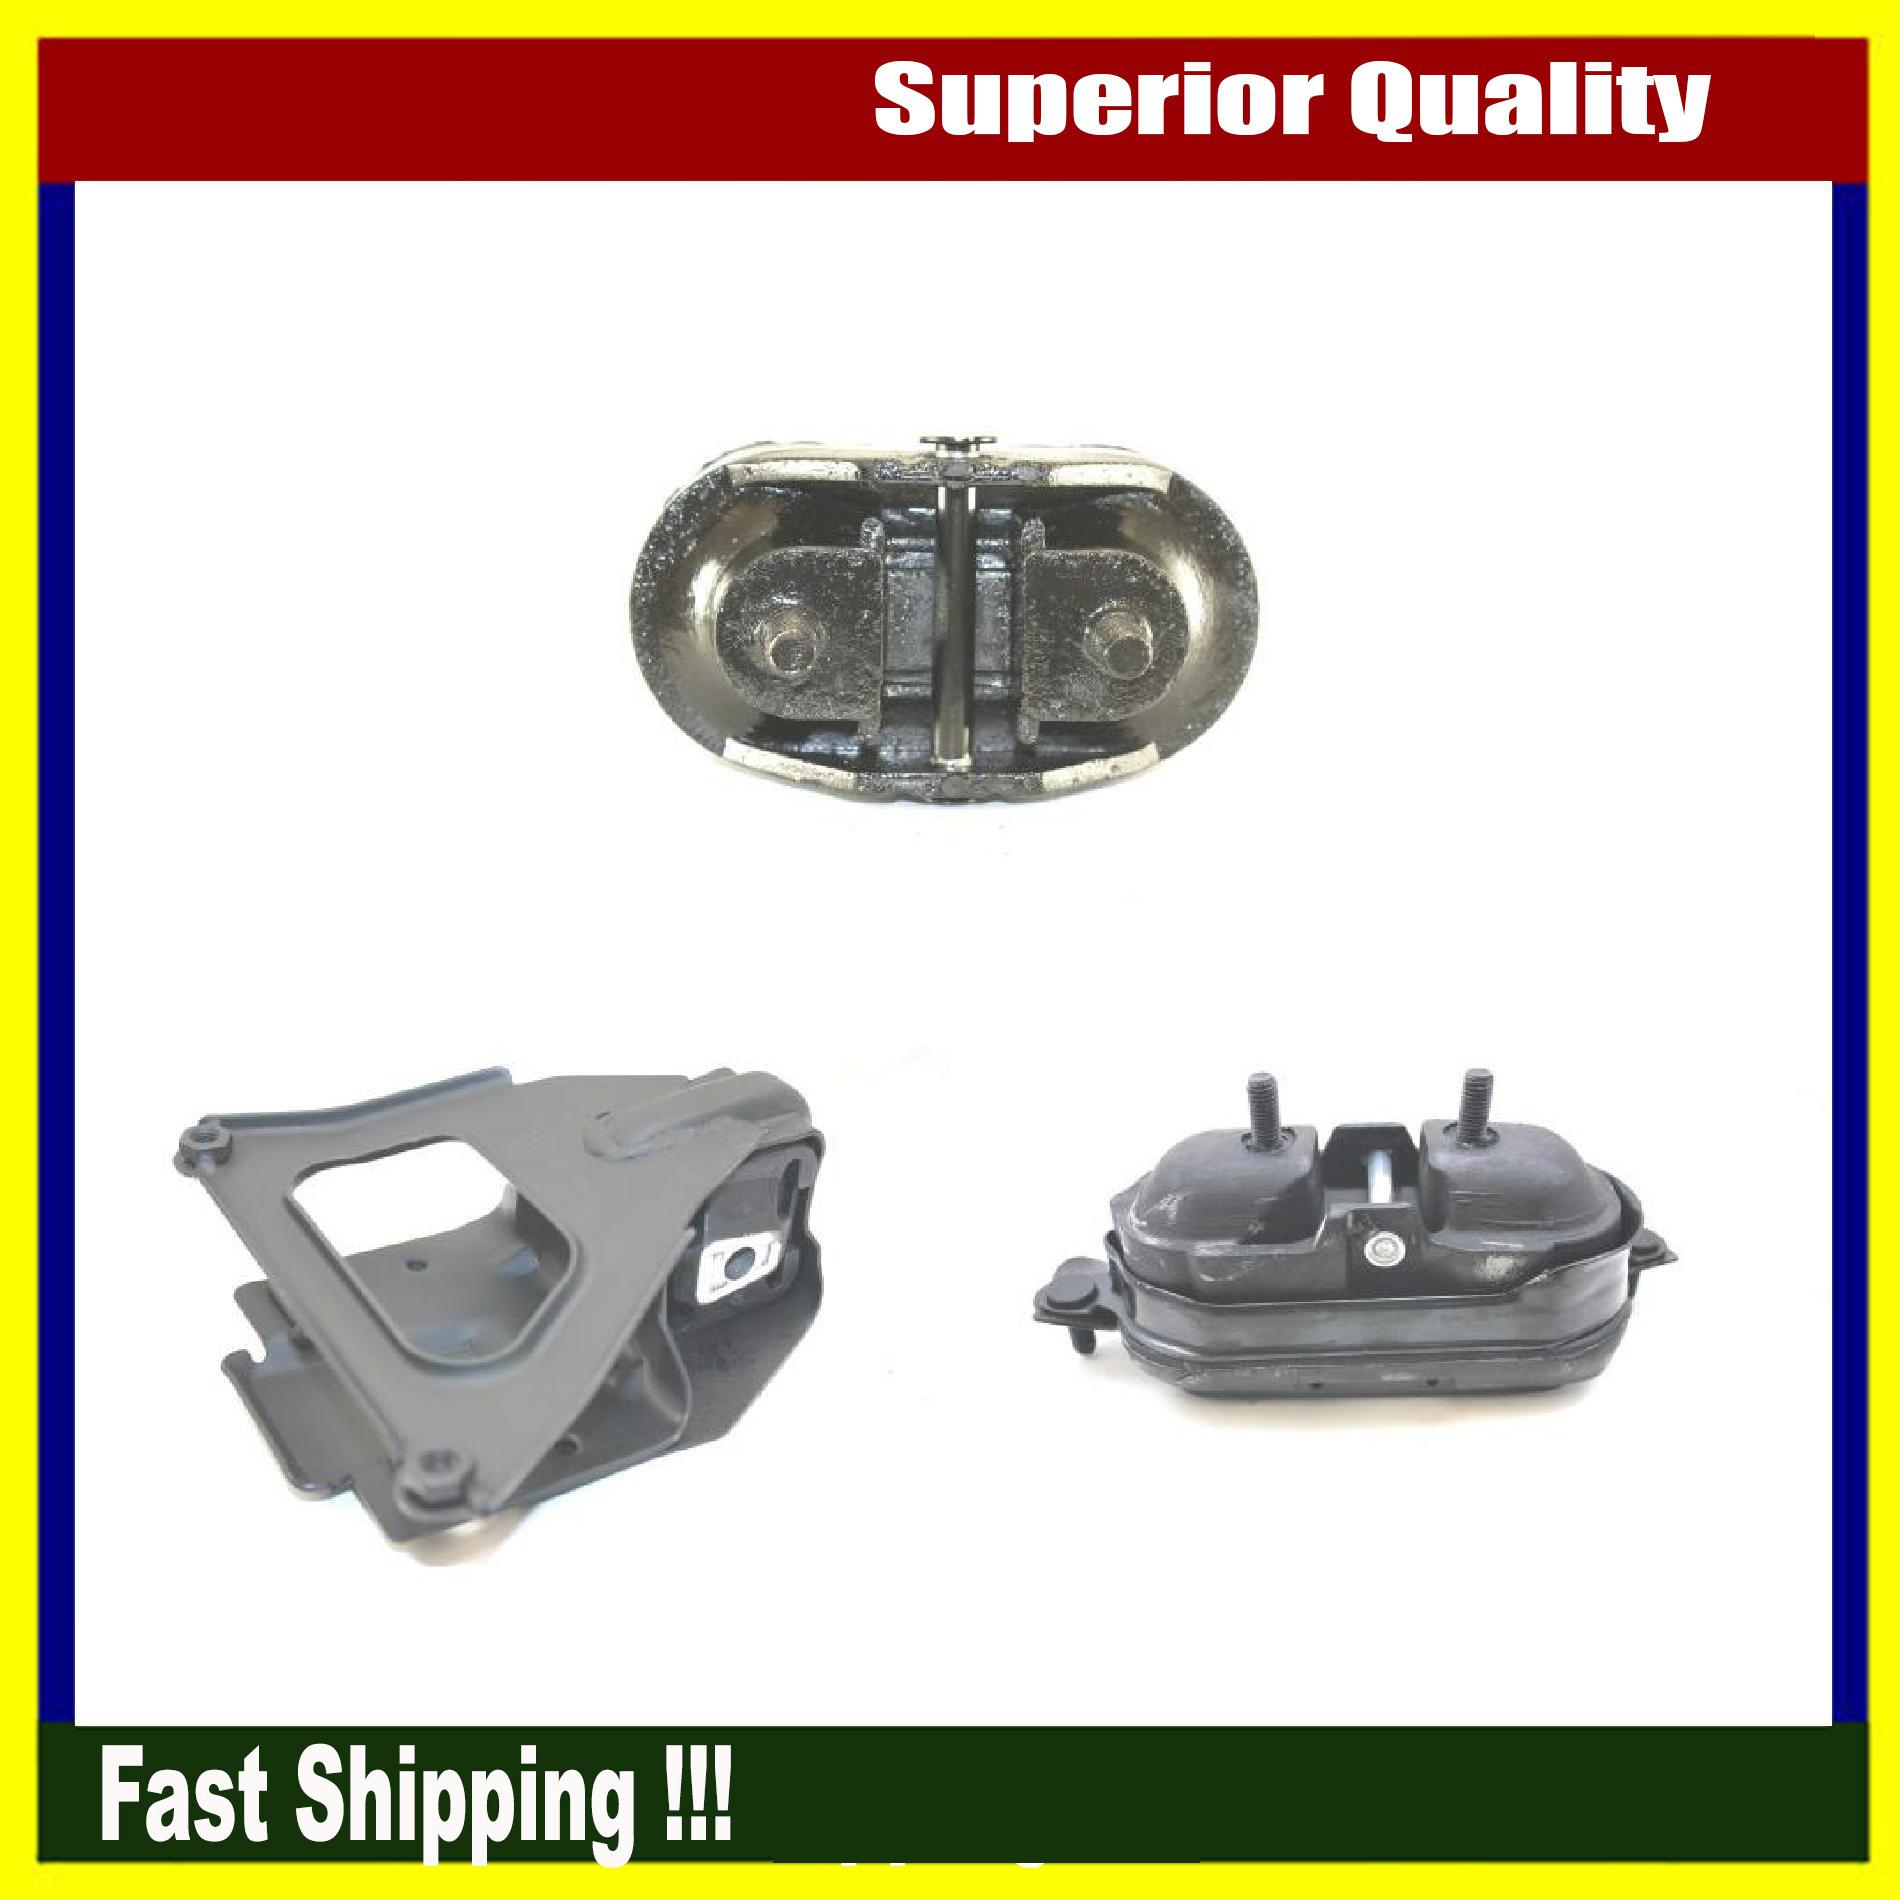 Set 3PCS For Chevrolet Monte Carlo LS 3.5L FWD Engine Motor /& Transmission Mount